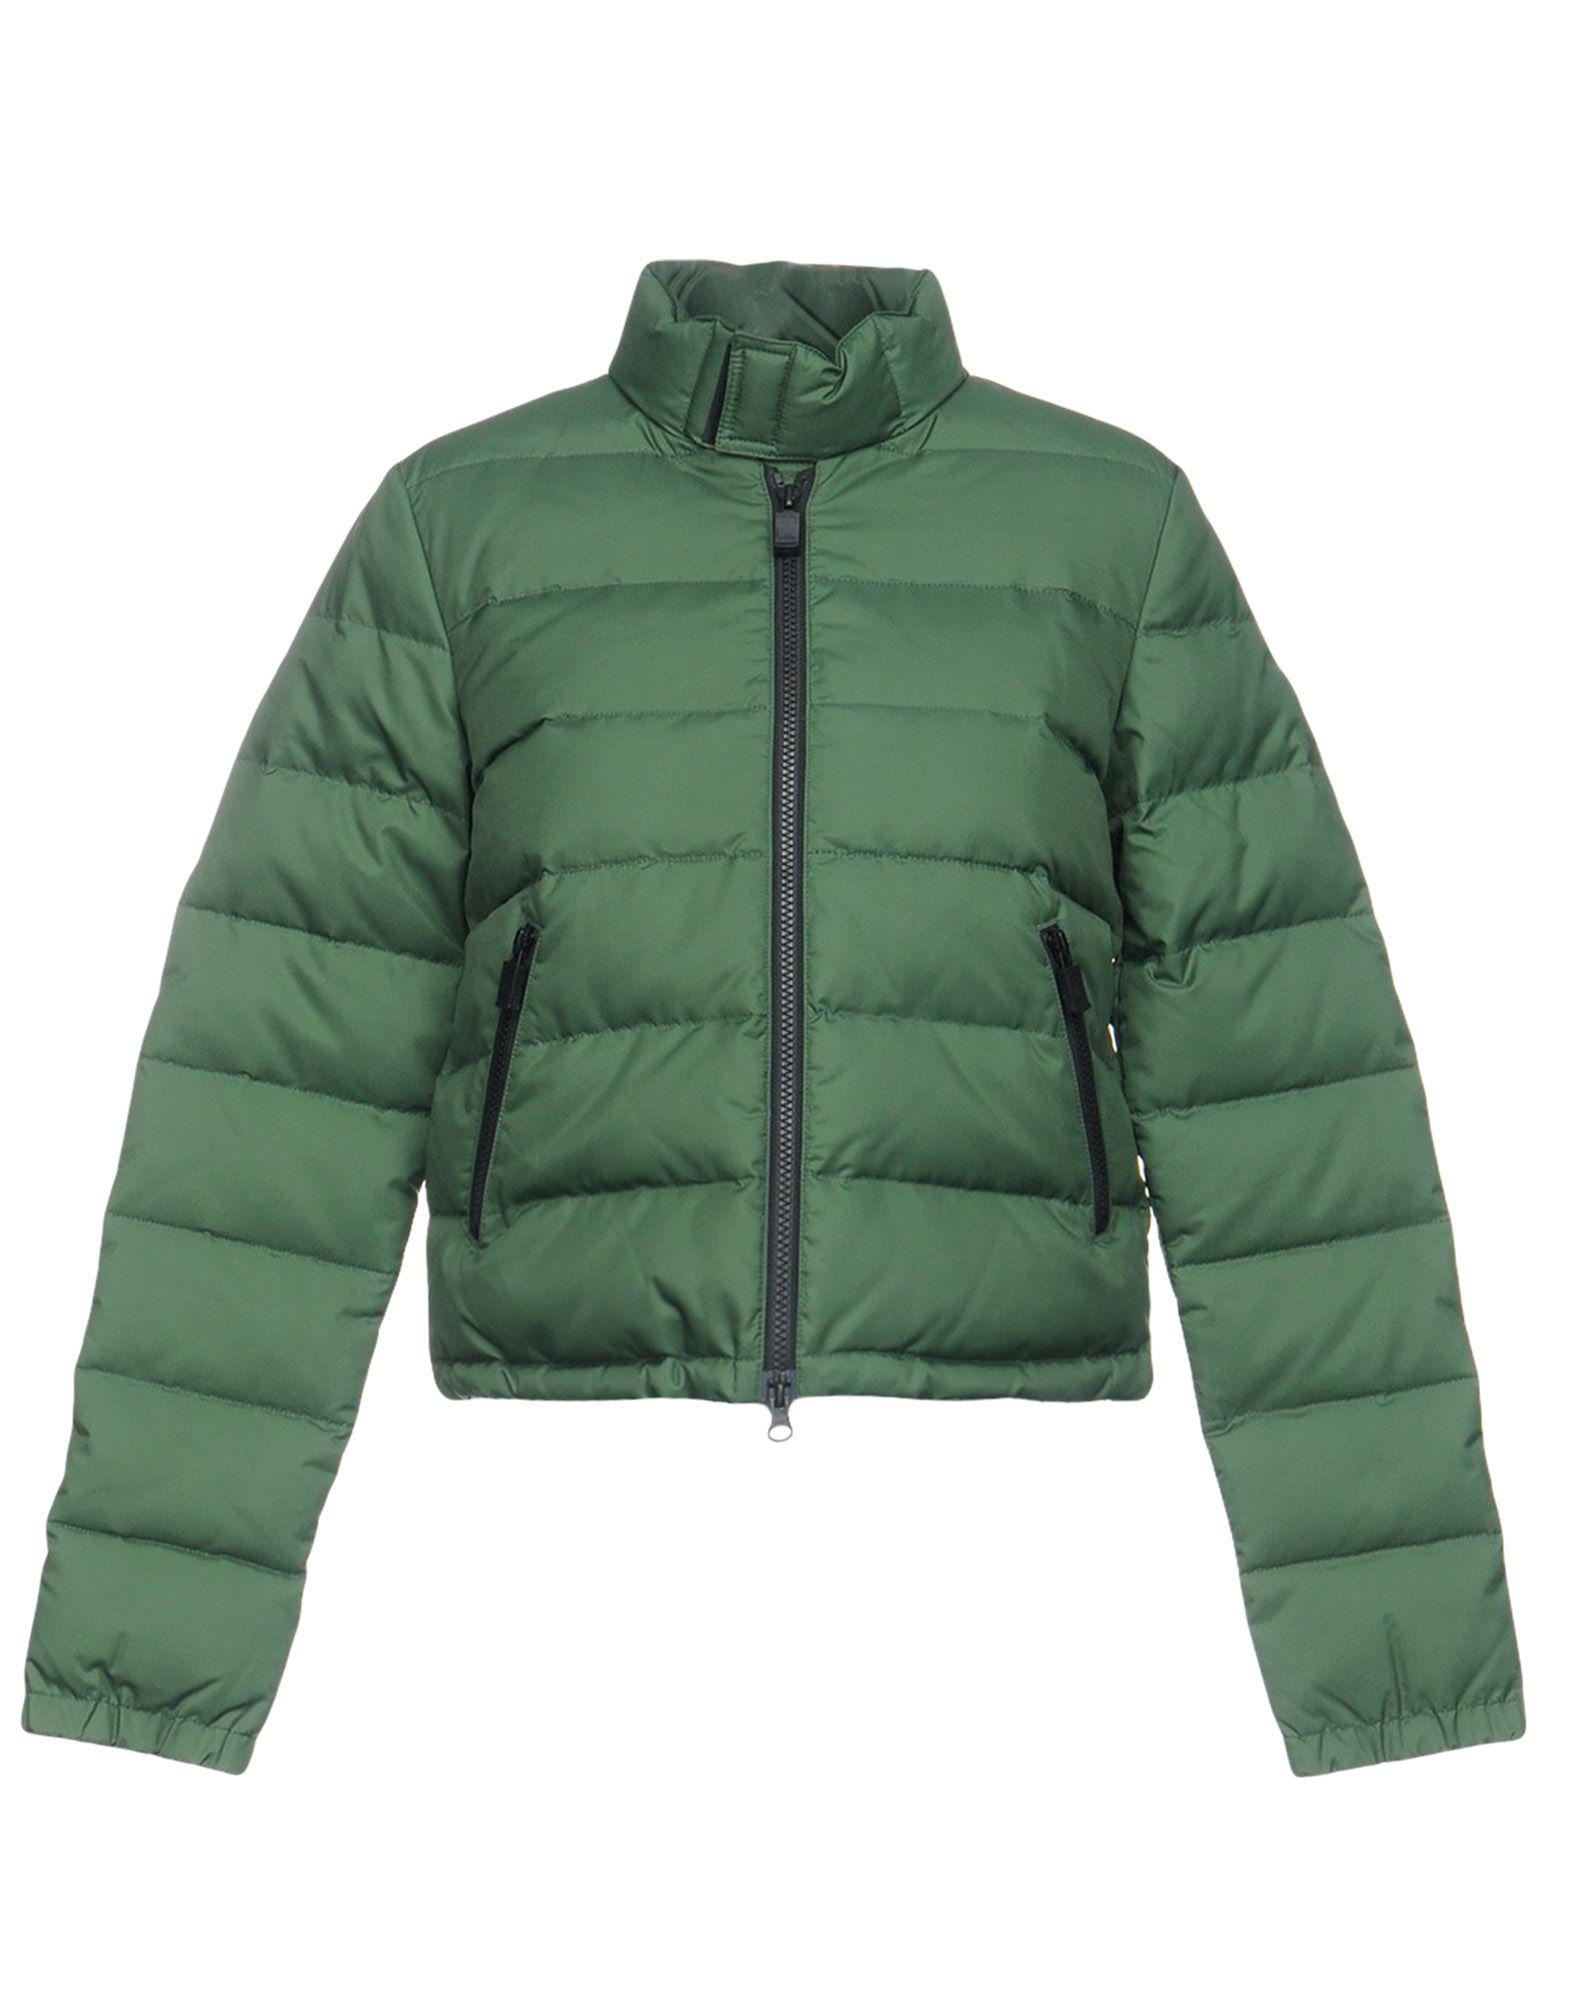 Aspesi Down Jacket in Green - Lyst e723ffb678a6